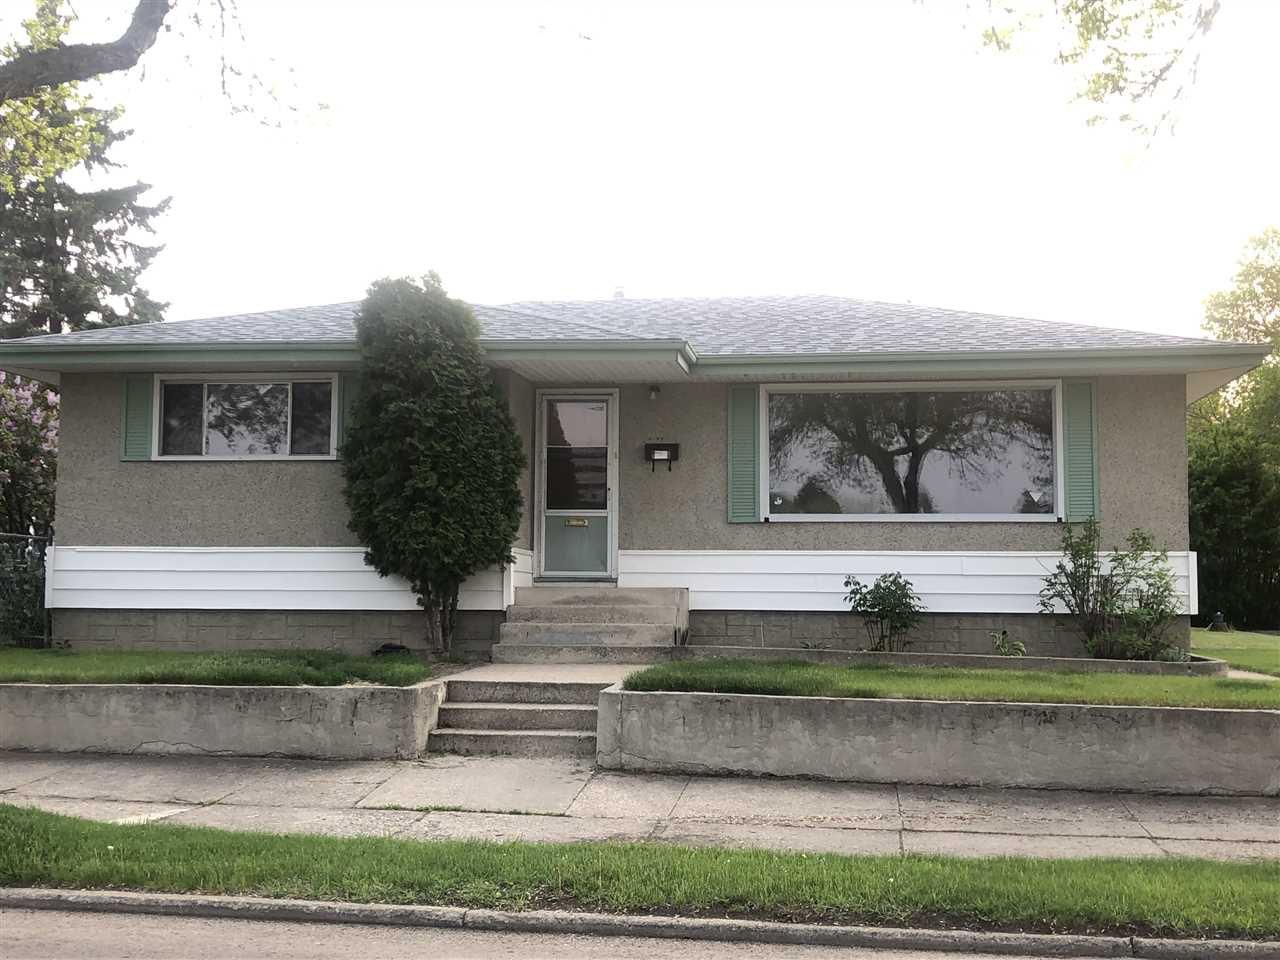 Main Photo: 4001 117 Avenue in Edmonton: Zone 23 House for sale : MLS®# E4147480